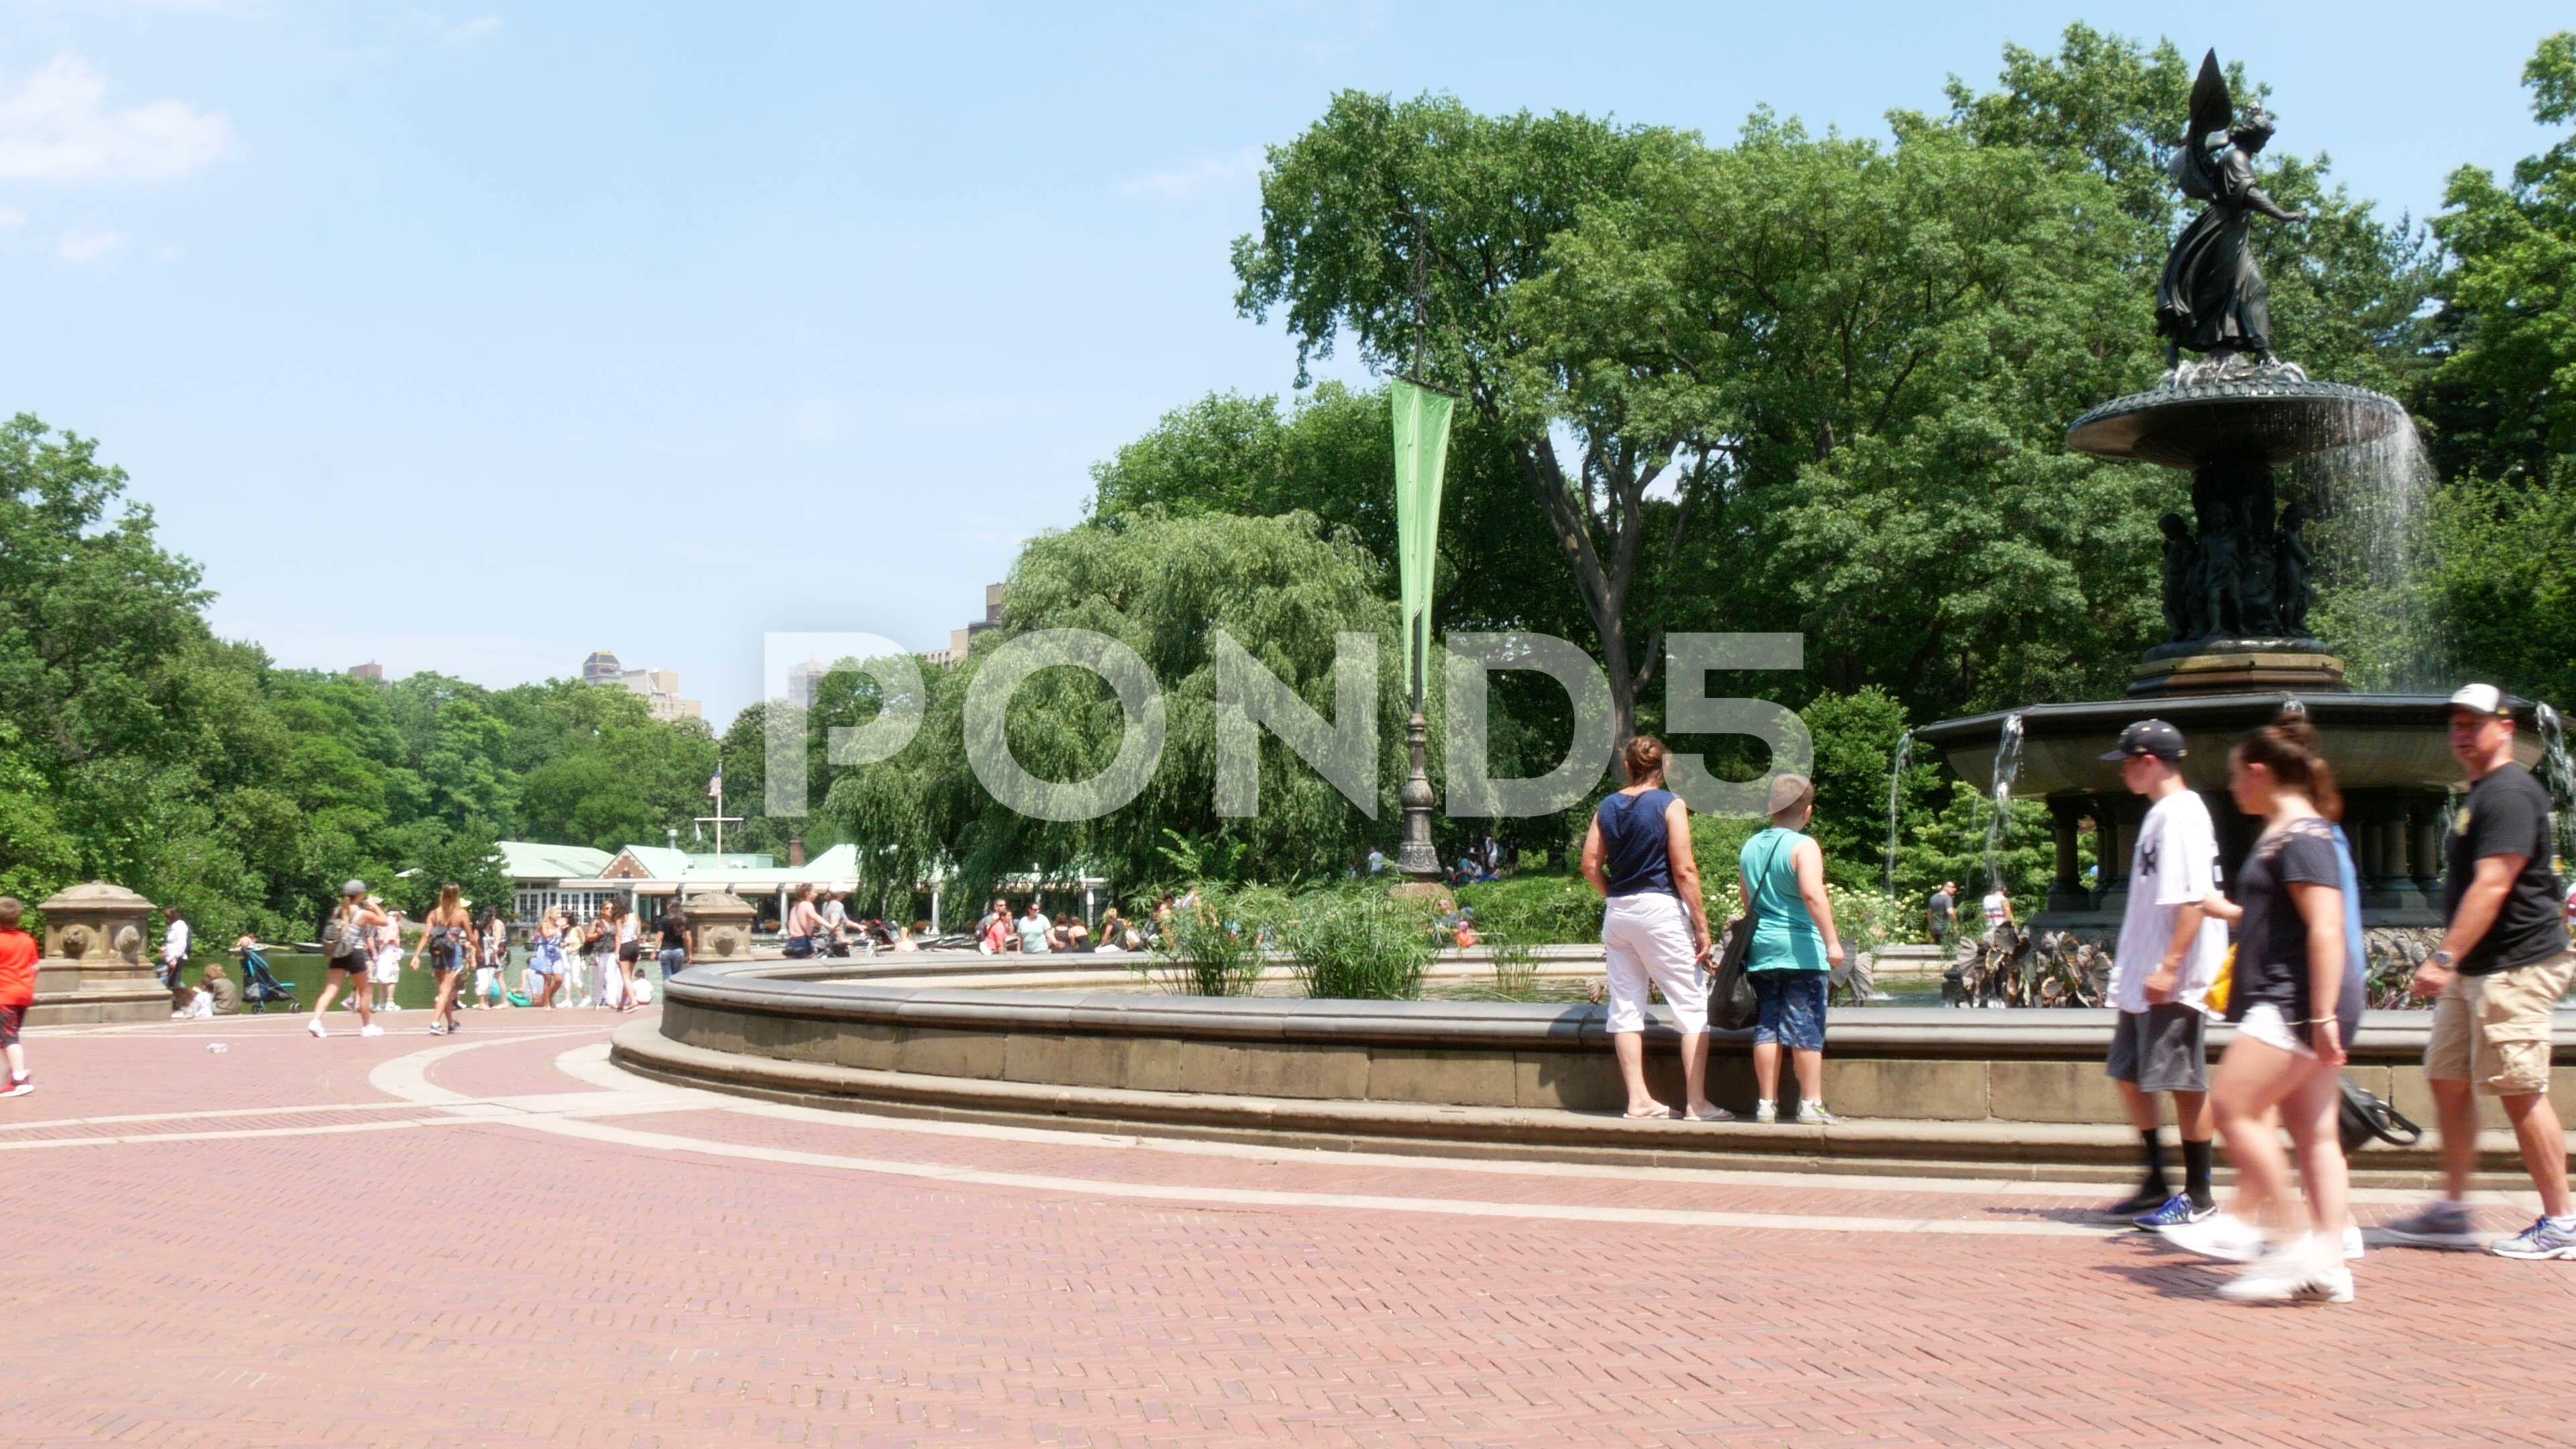 Bethesda fountain at Central Park, New York City Stock